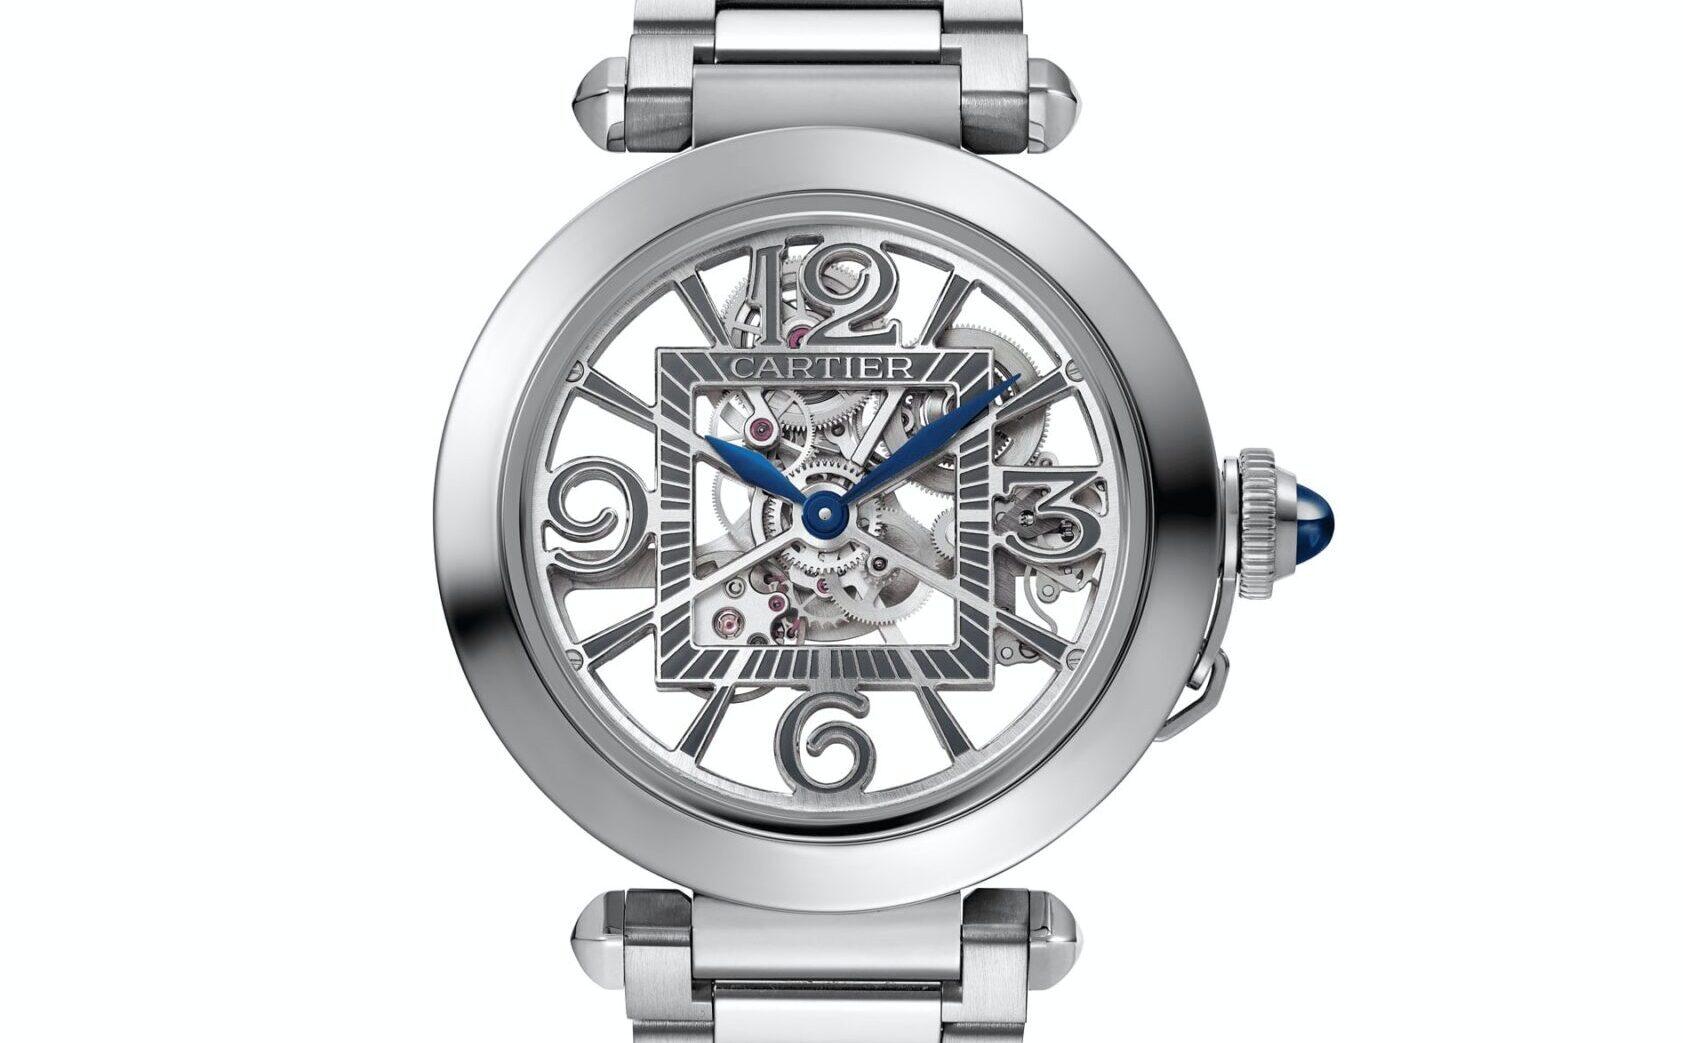 Cartier Pasha Skeleton-Watches Wonders 2020-